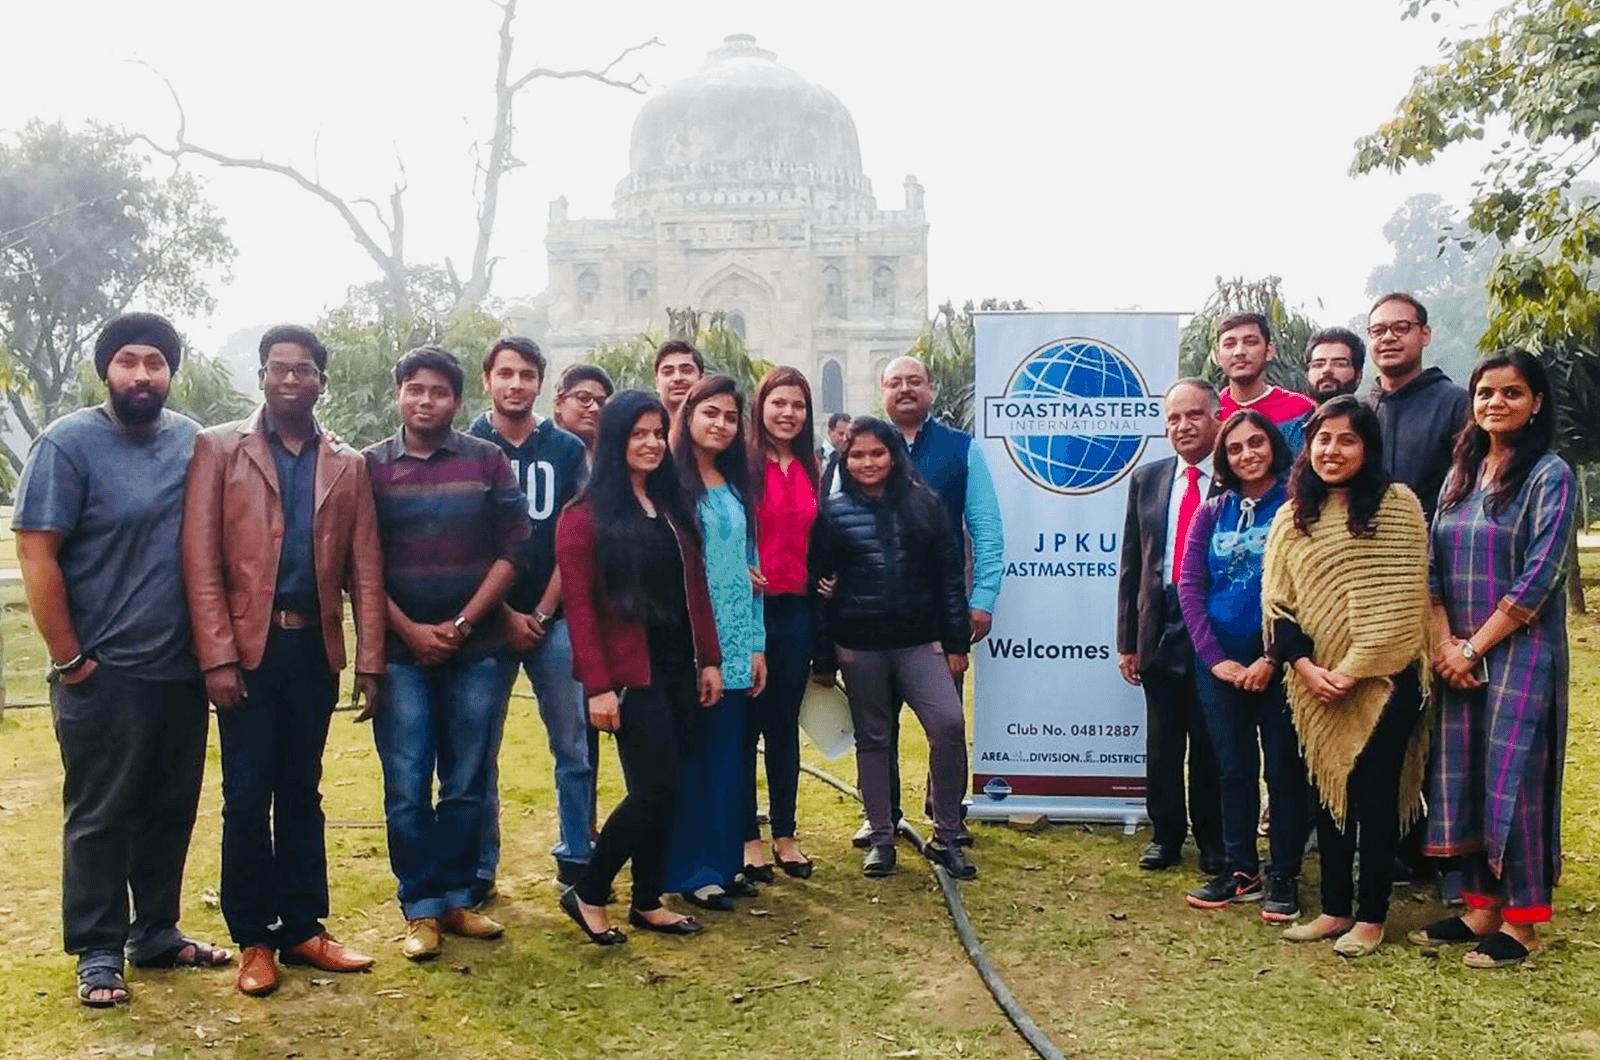 International President Deepak Menon poses with members of the JPKU Toastmasters club in New Delhi, India.